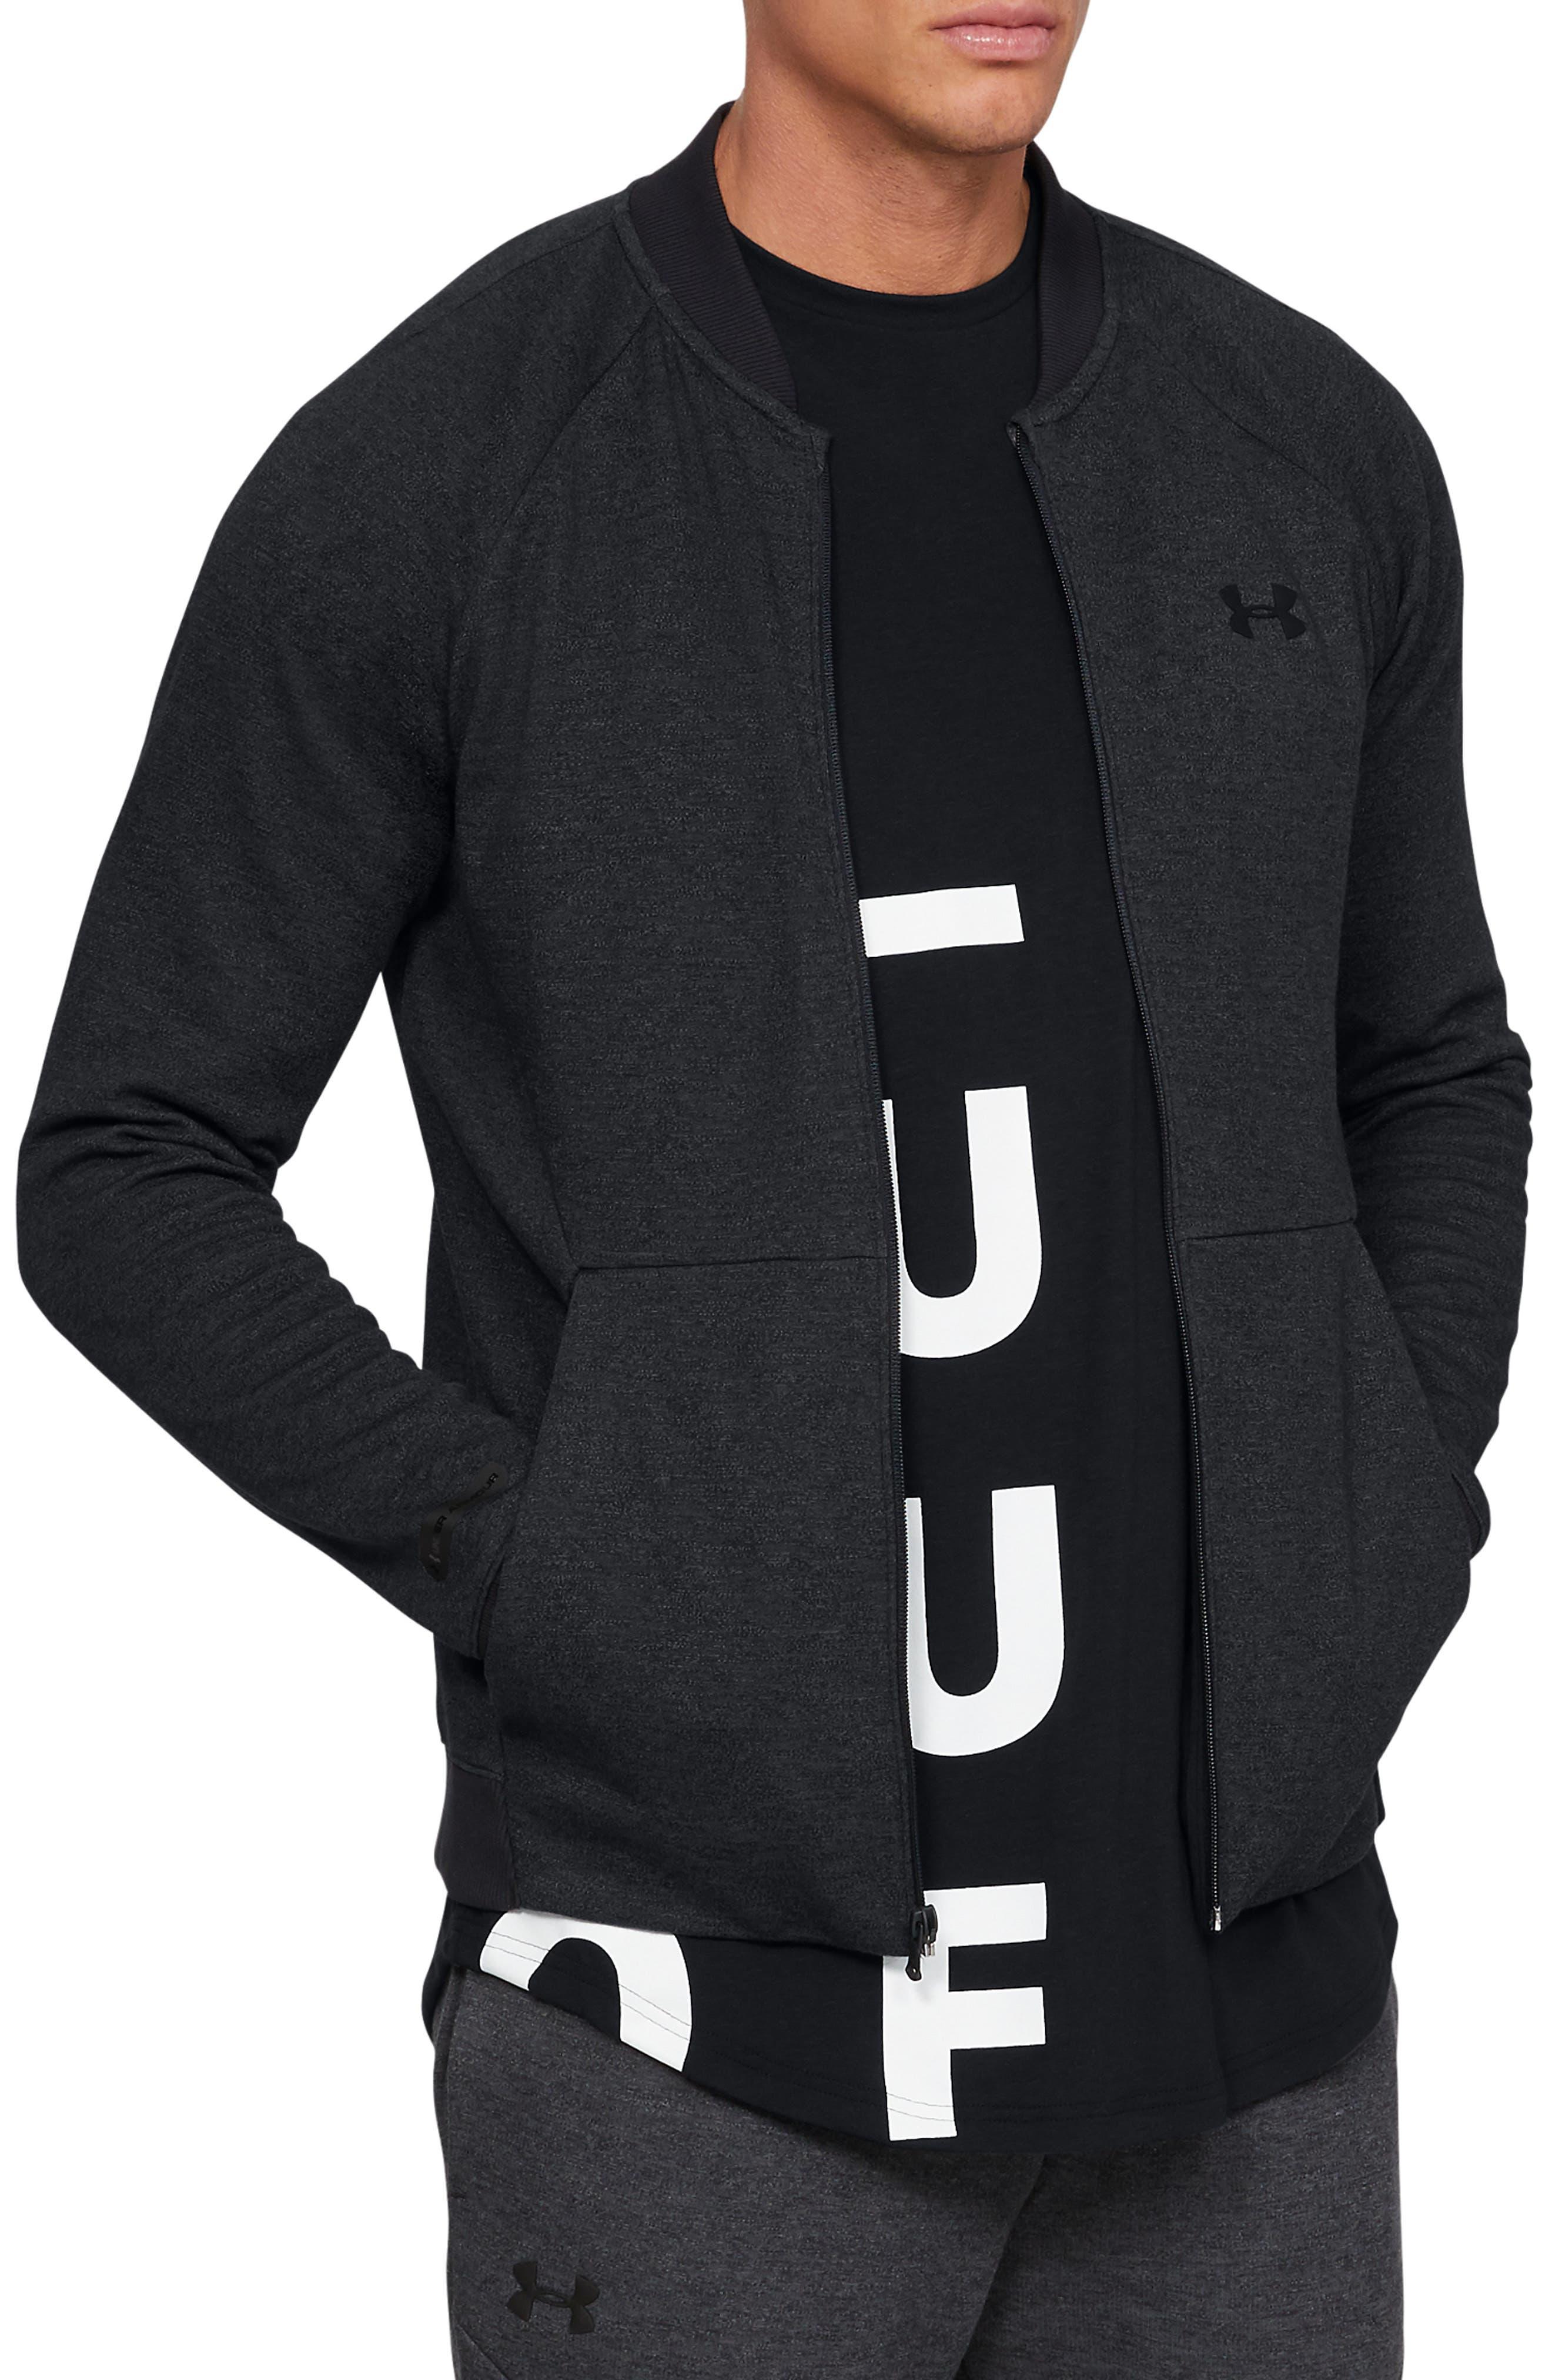 Unstoppable Double Knit Bomber Jacket, Main, color, BLACK/ BLACK/ BLACK